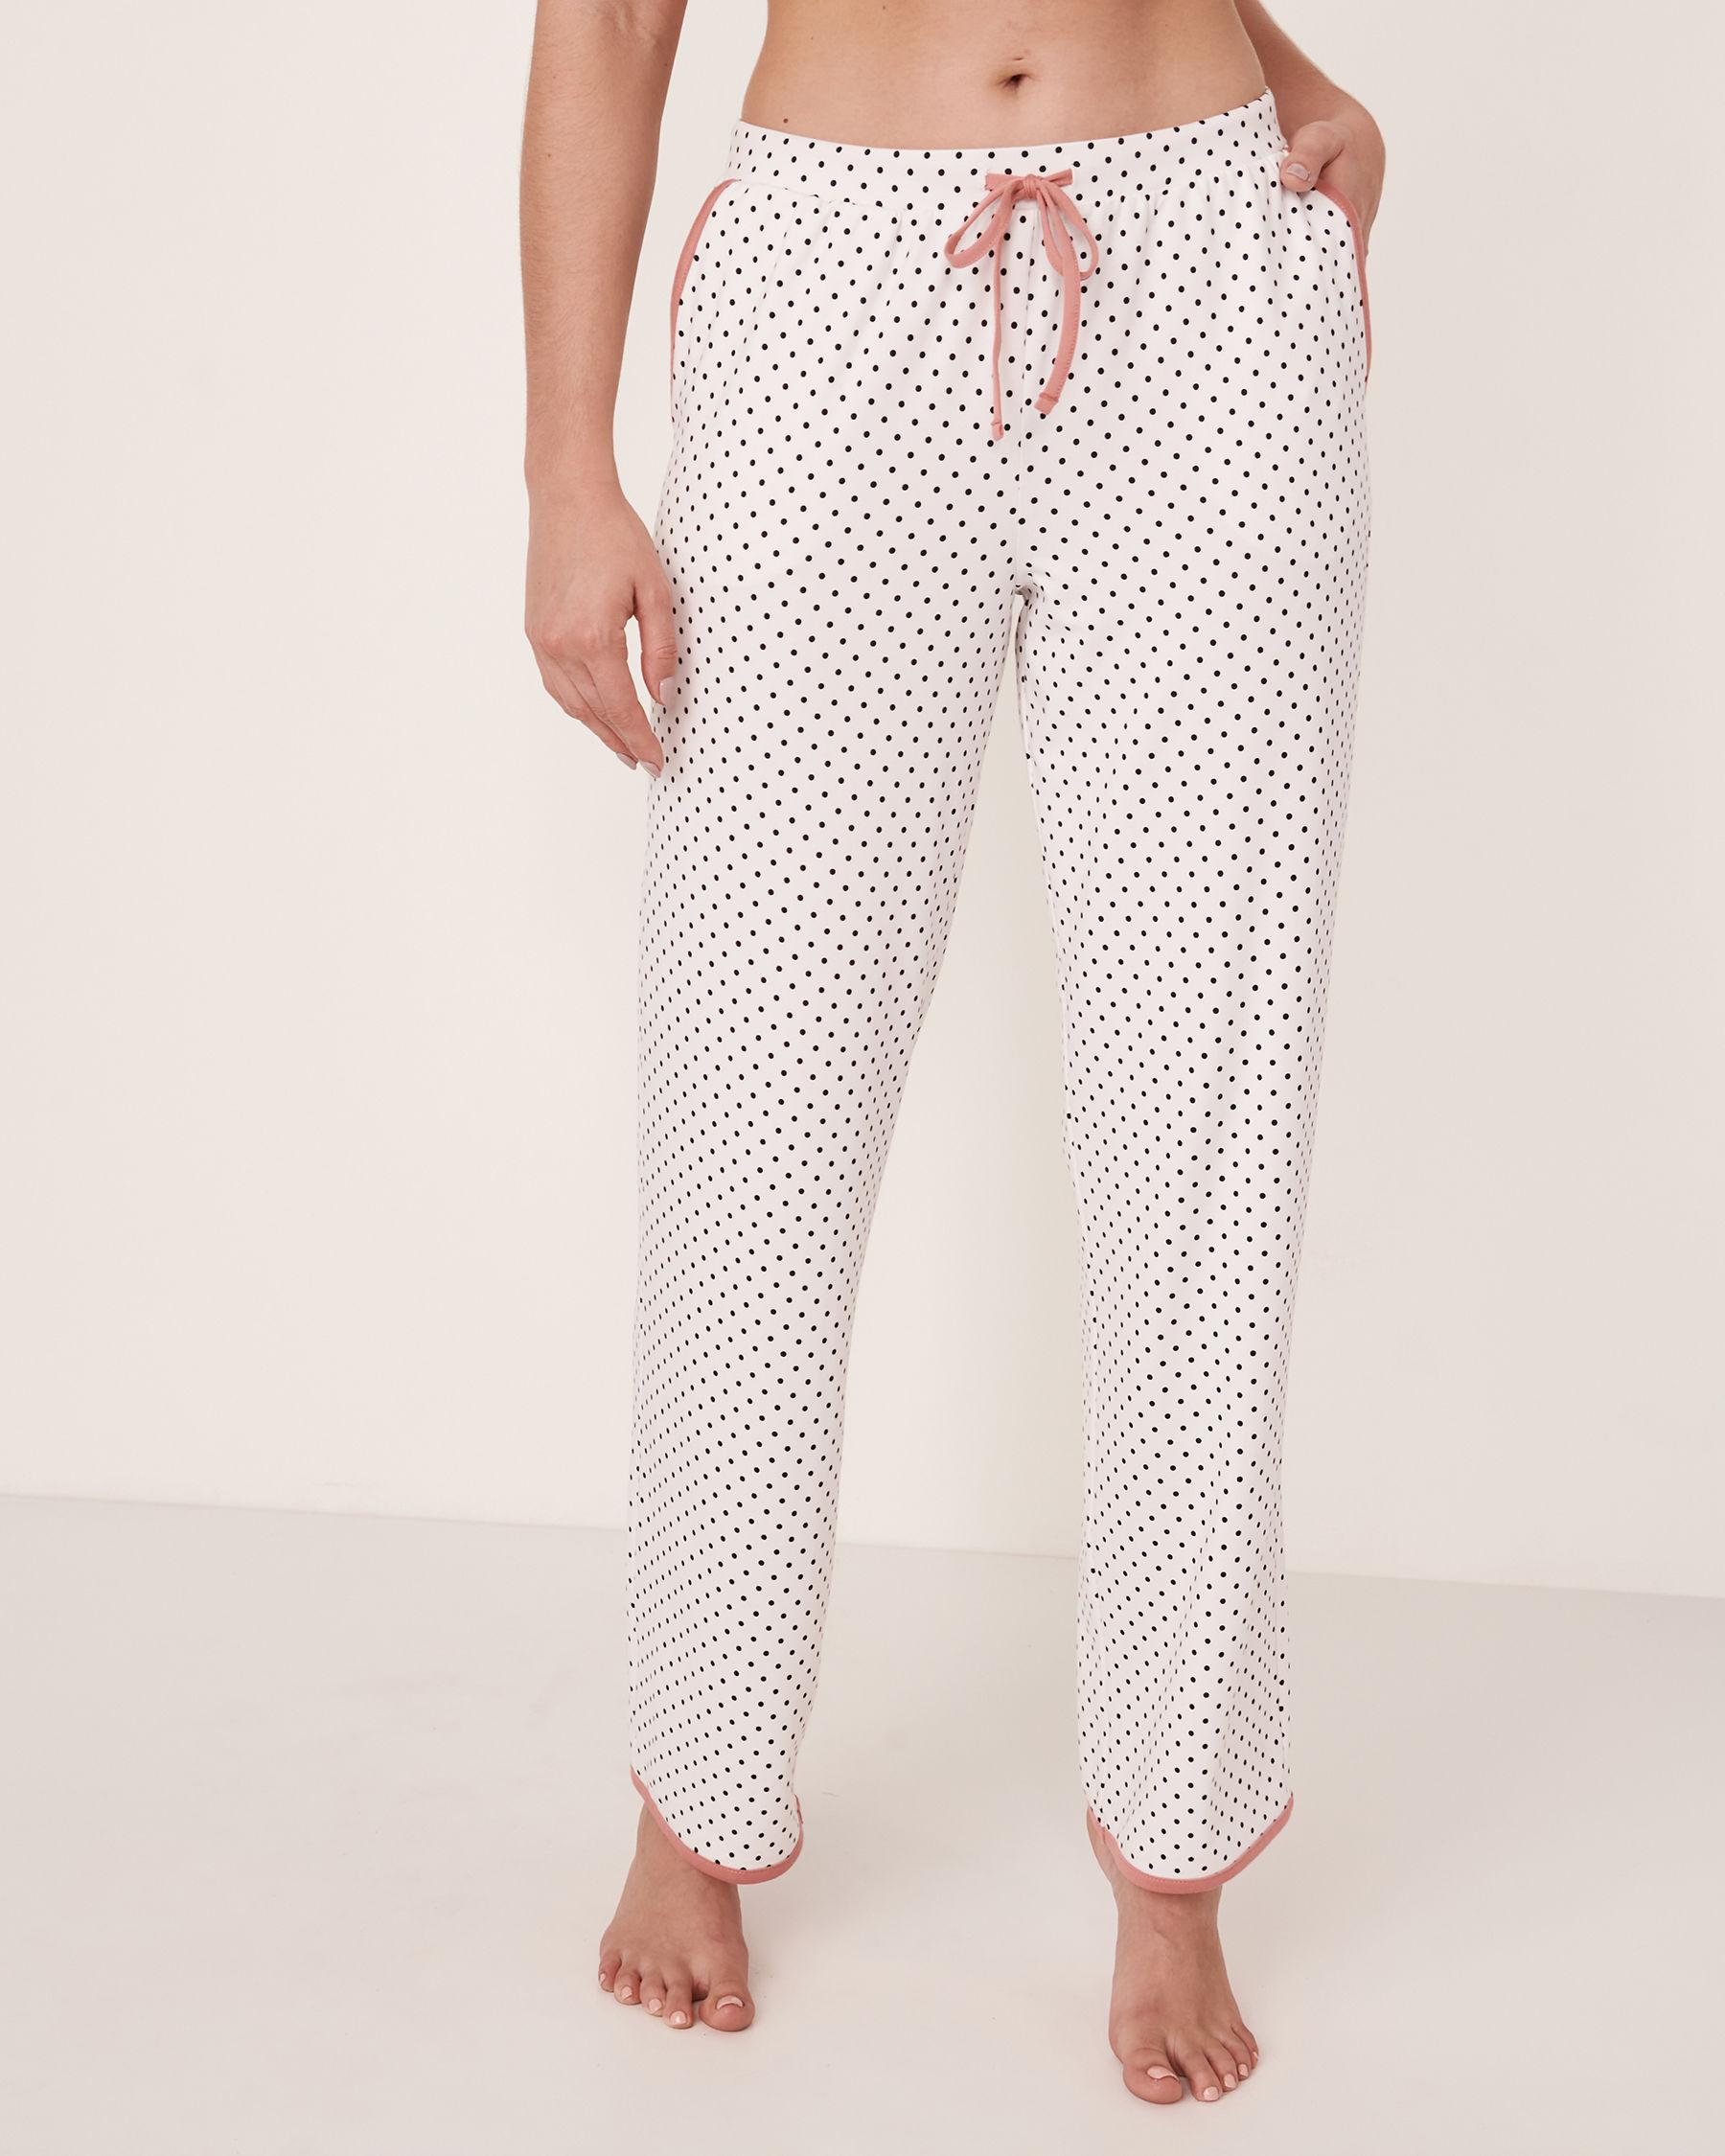 LA VIE EN ROSE 3D Cat Pyjama Pant Black dot 40200083 - View3